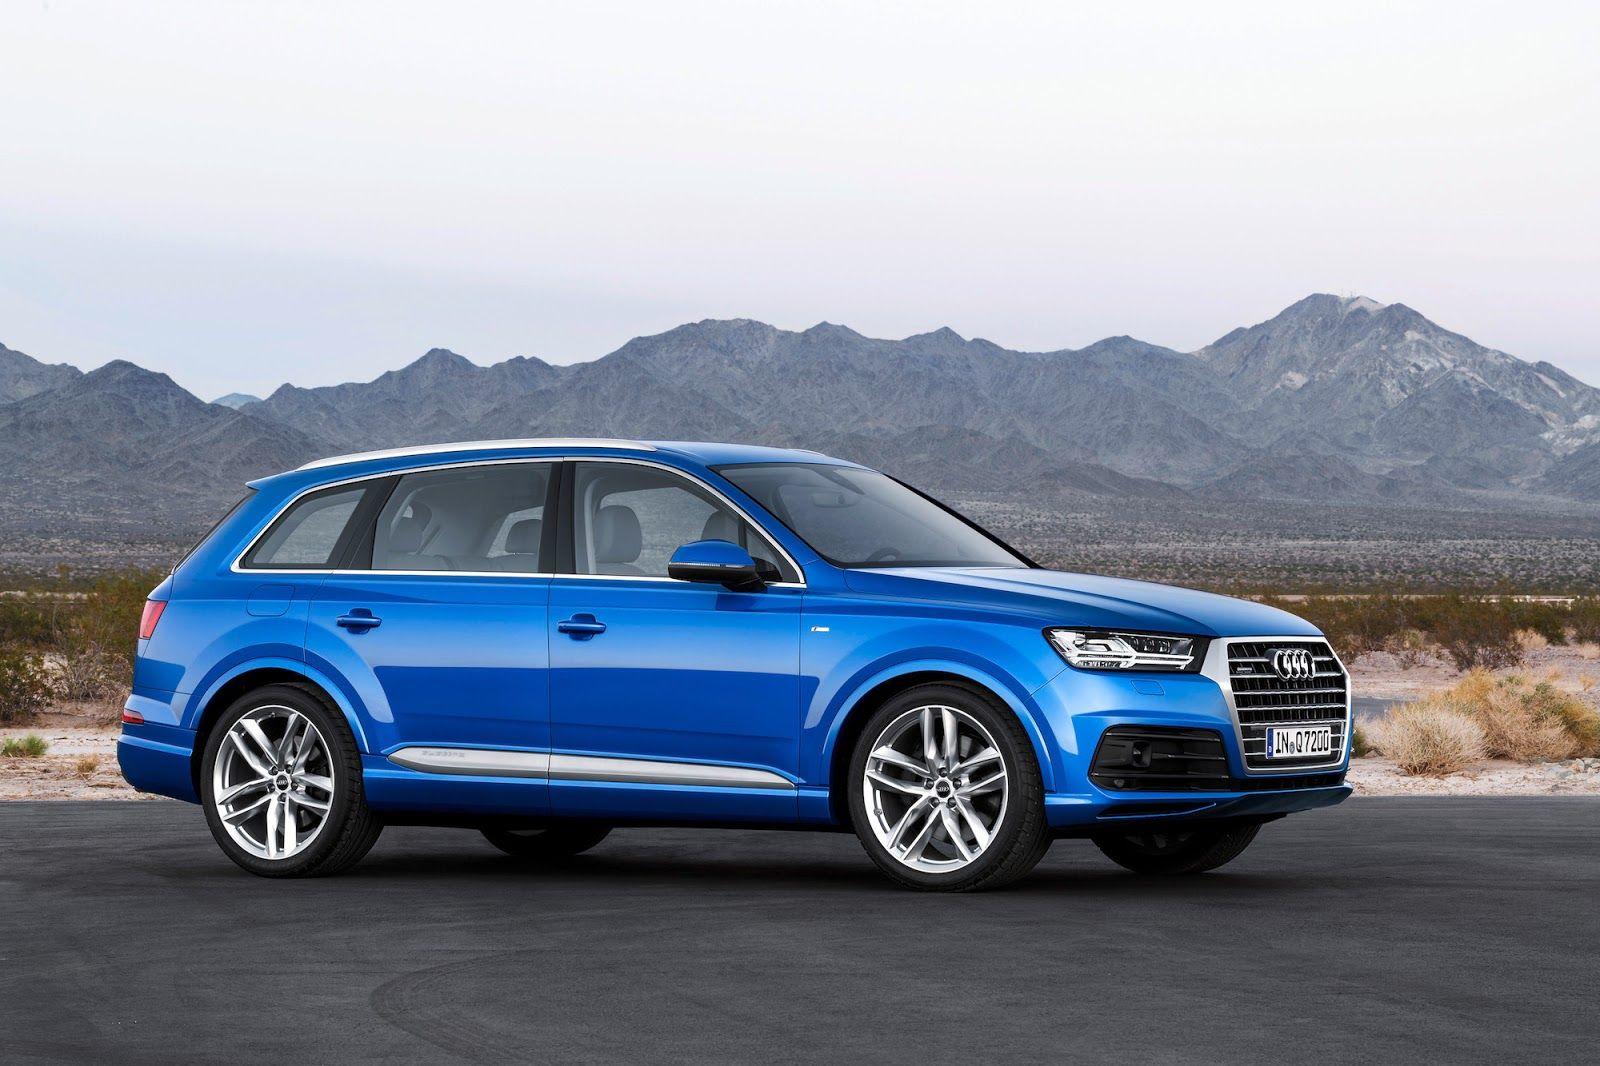 New Second Generation Audi Q7 | Audi | Audi cars, Audi q7